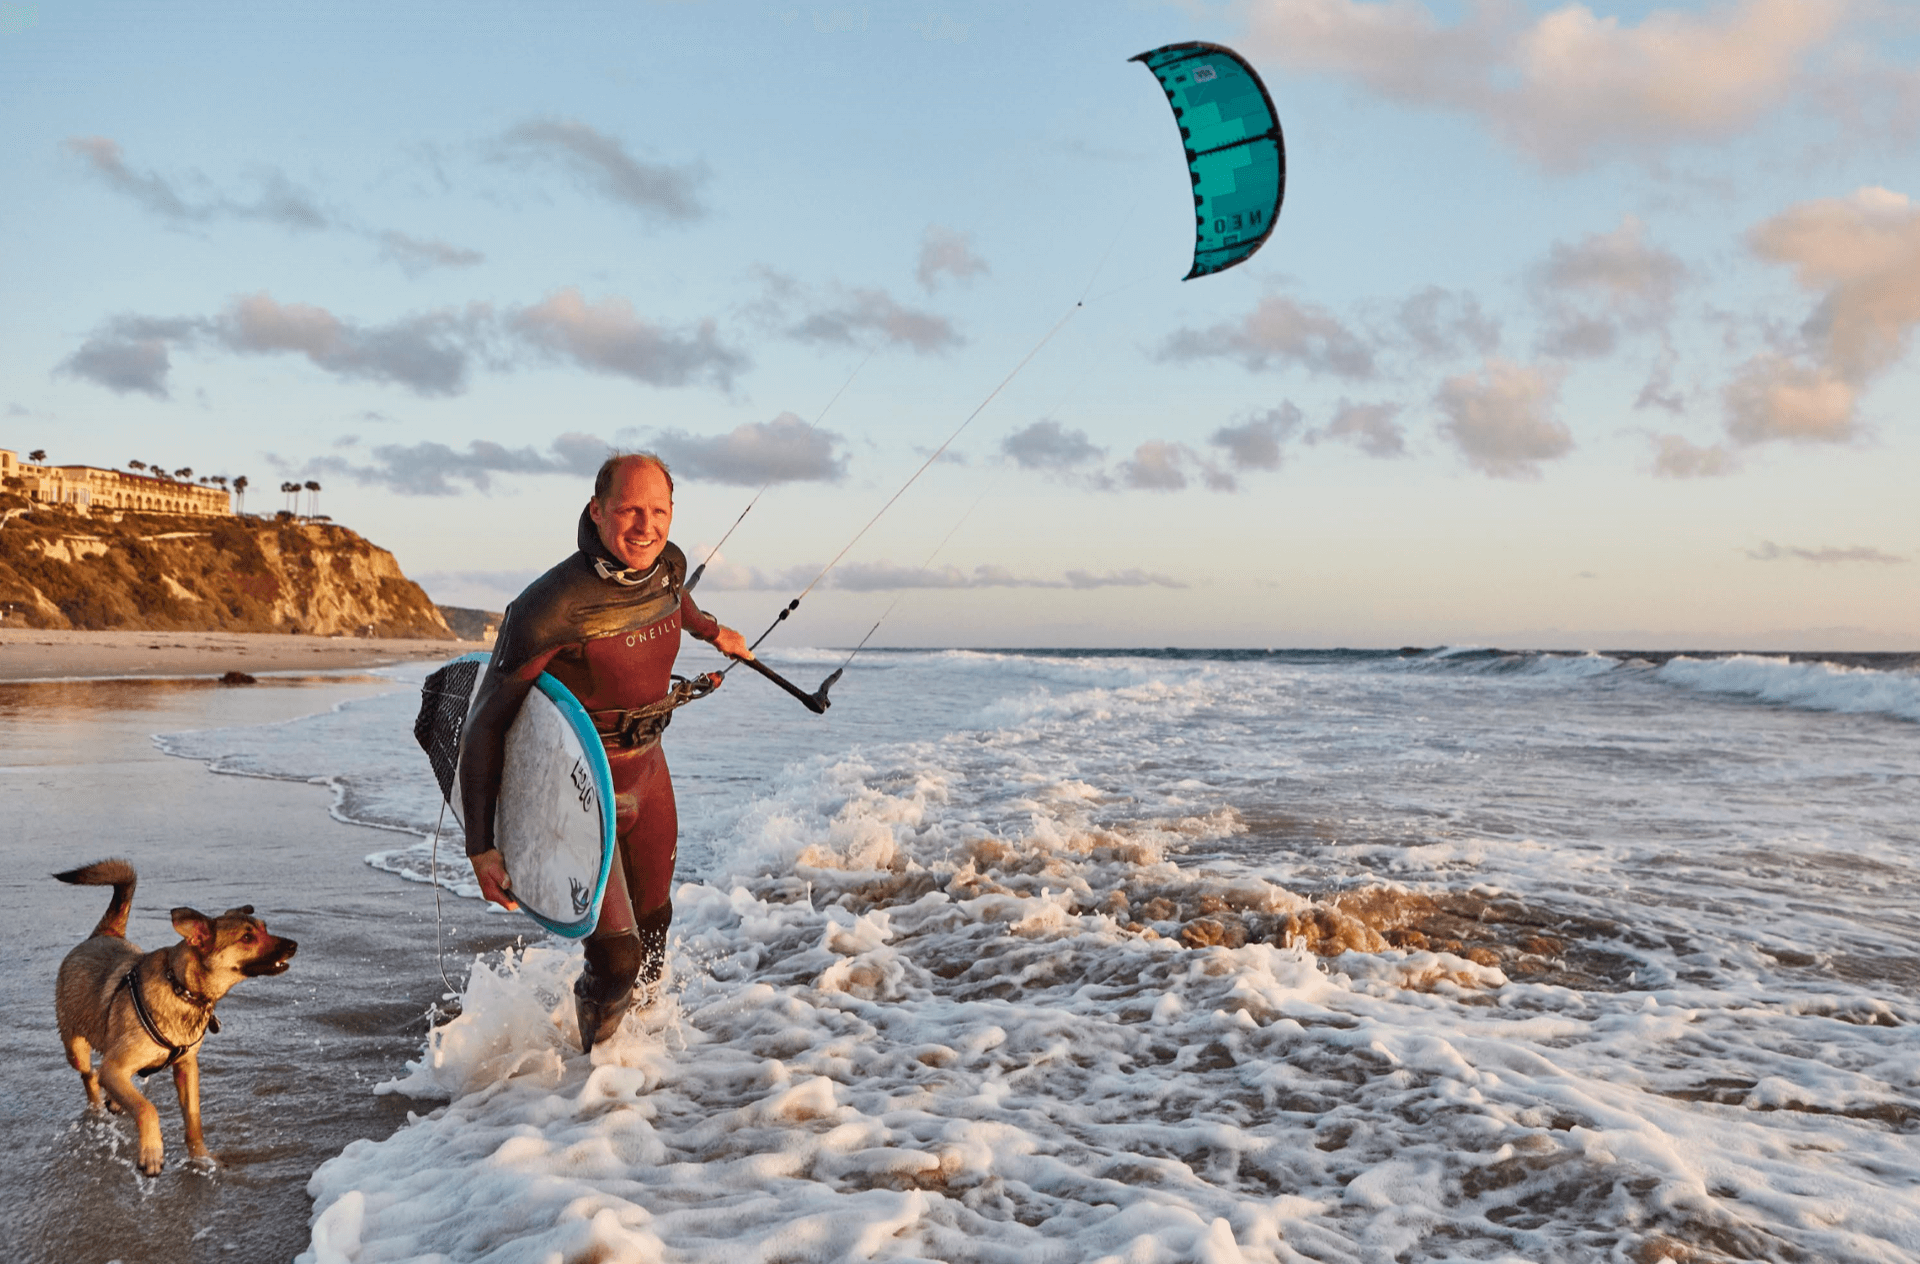 dr. eric vanek surfing picture